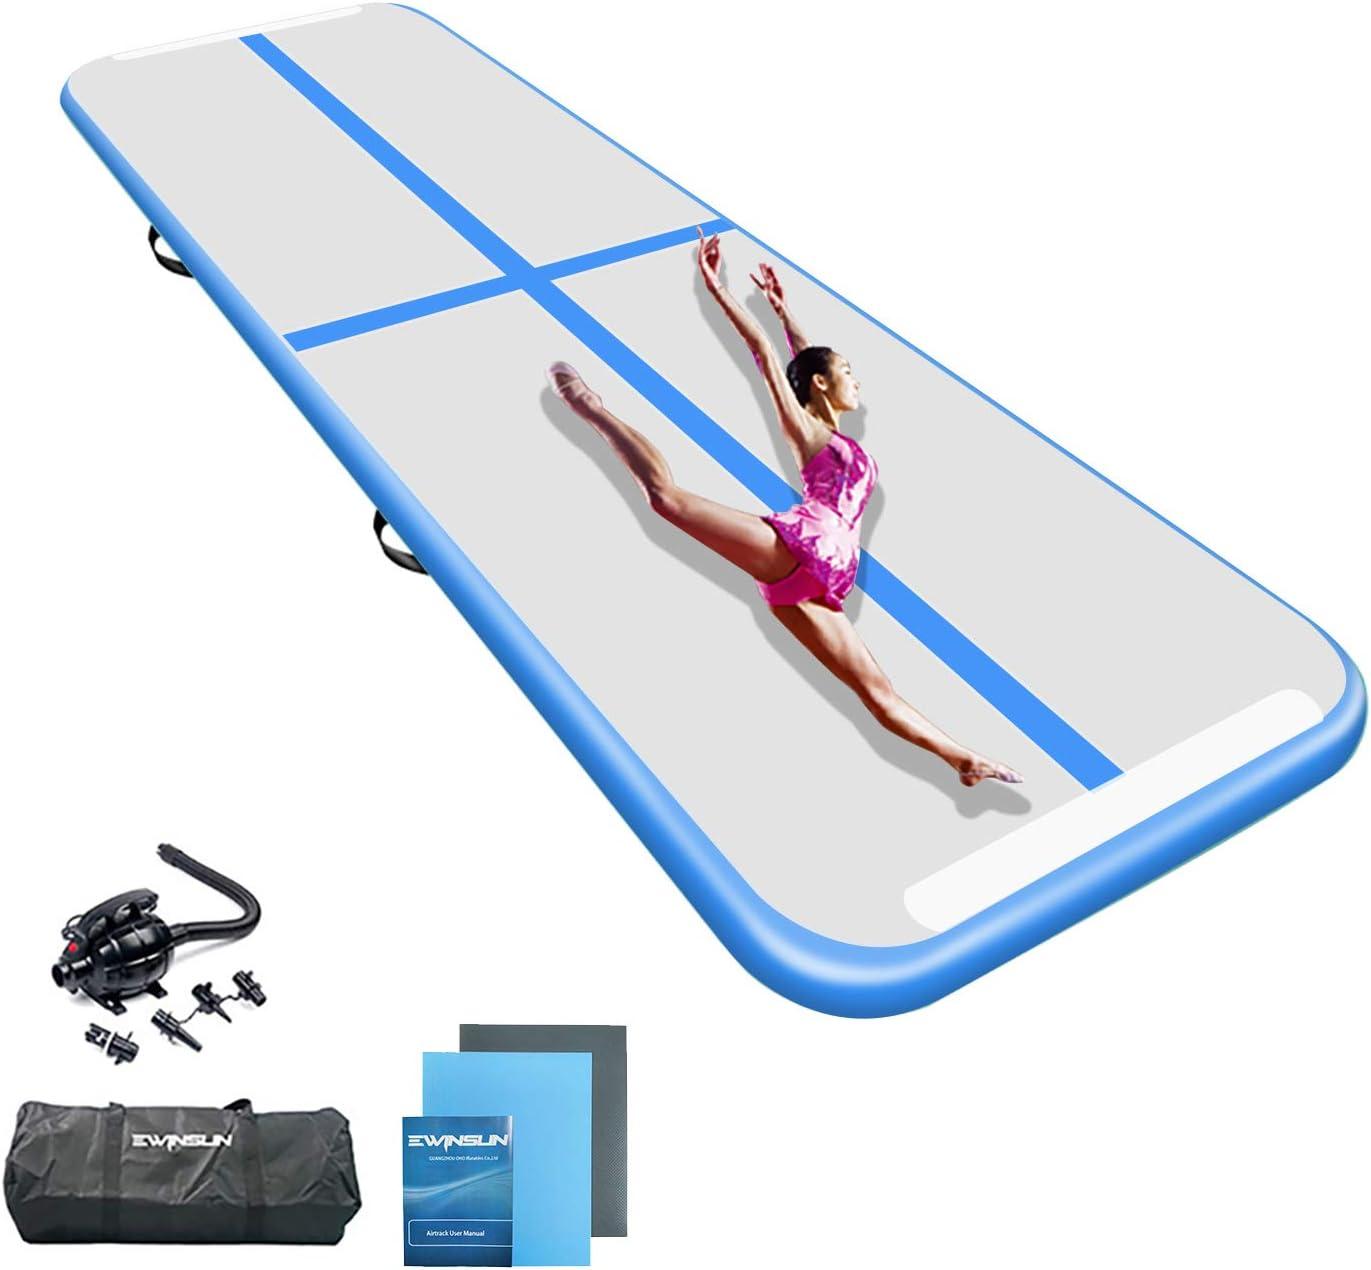 Electric Air Pump For Air Track Inflatable Tumbling Home Gymnastics Tumbling Mat